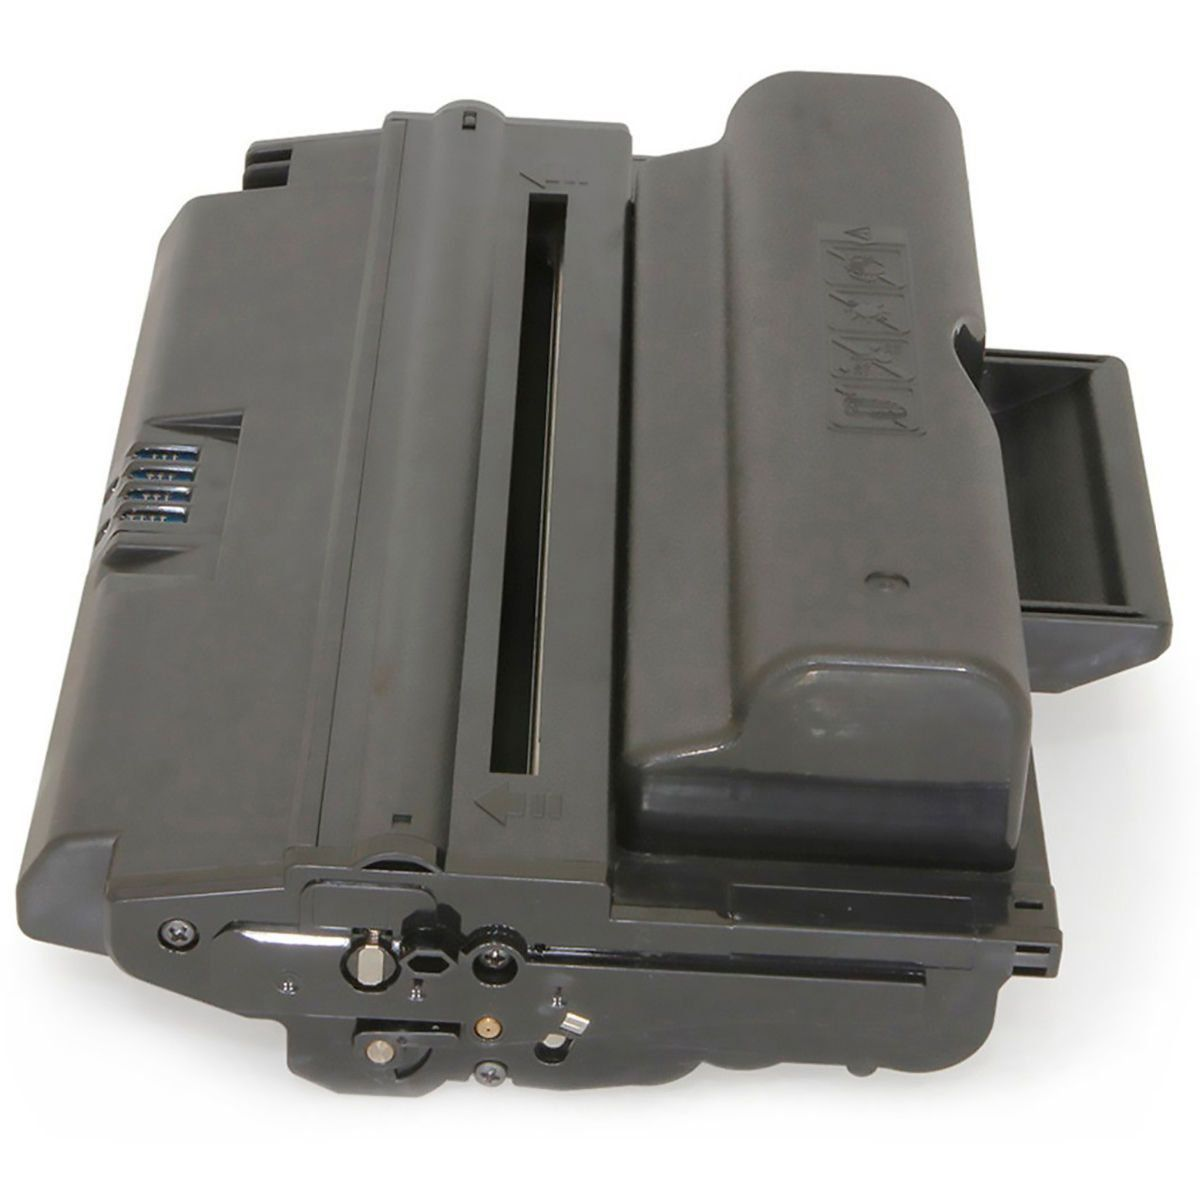 Compatível: Toner 3550S X3550S para Impressora Xerox WorkCentre 3550 WC3550 WC3550s 3550s Phaser 3550 / Preto / 5.000